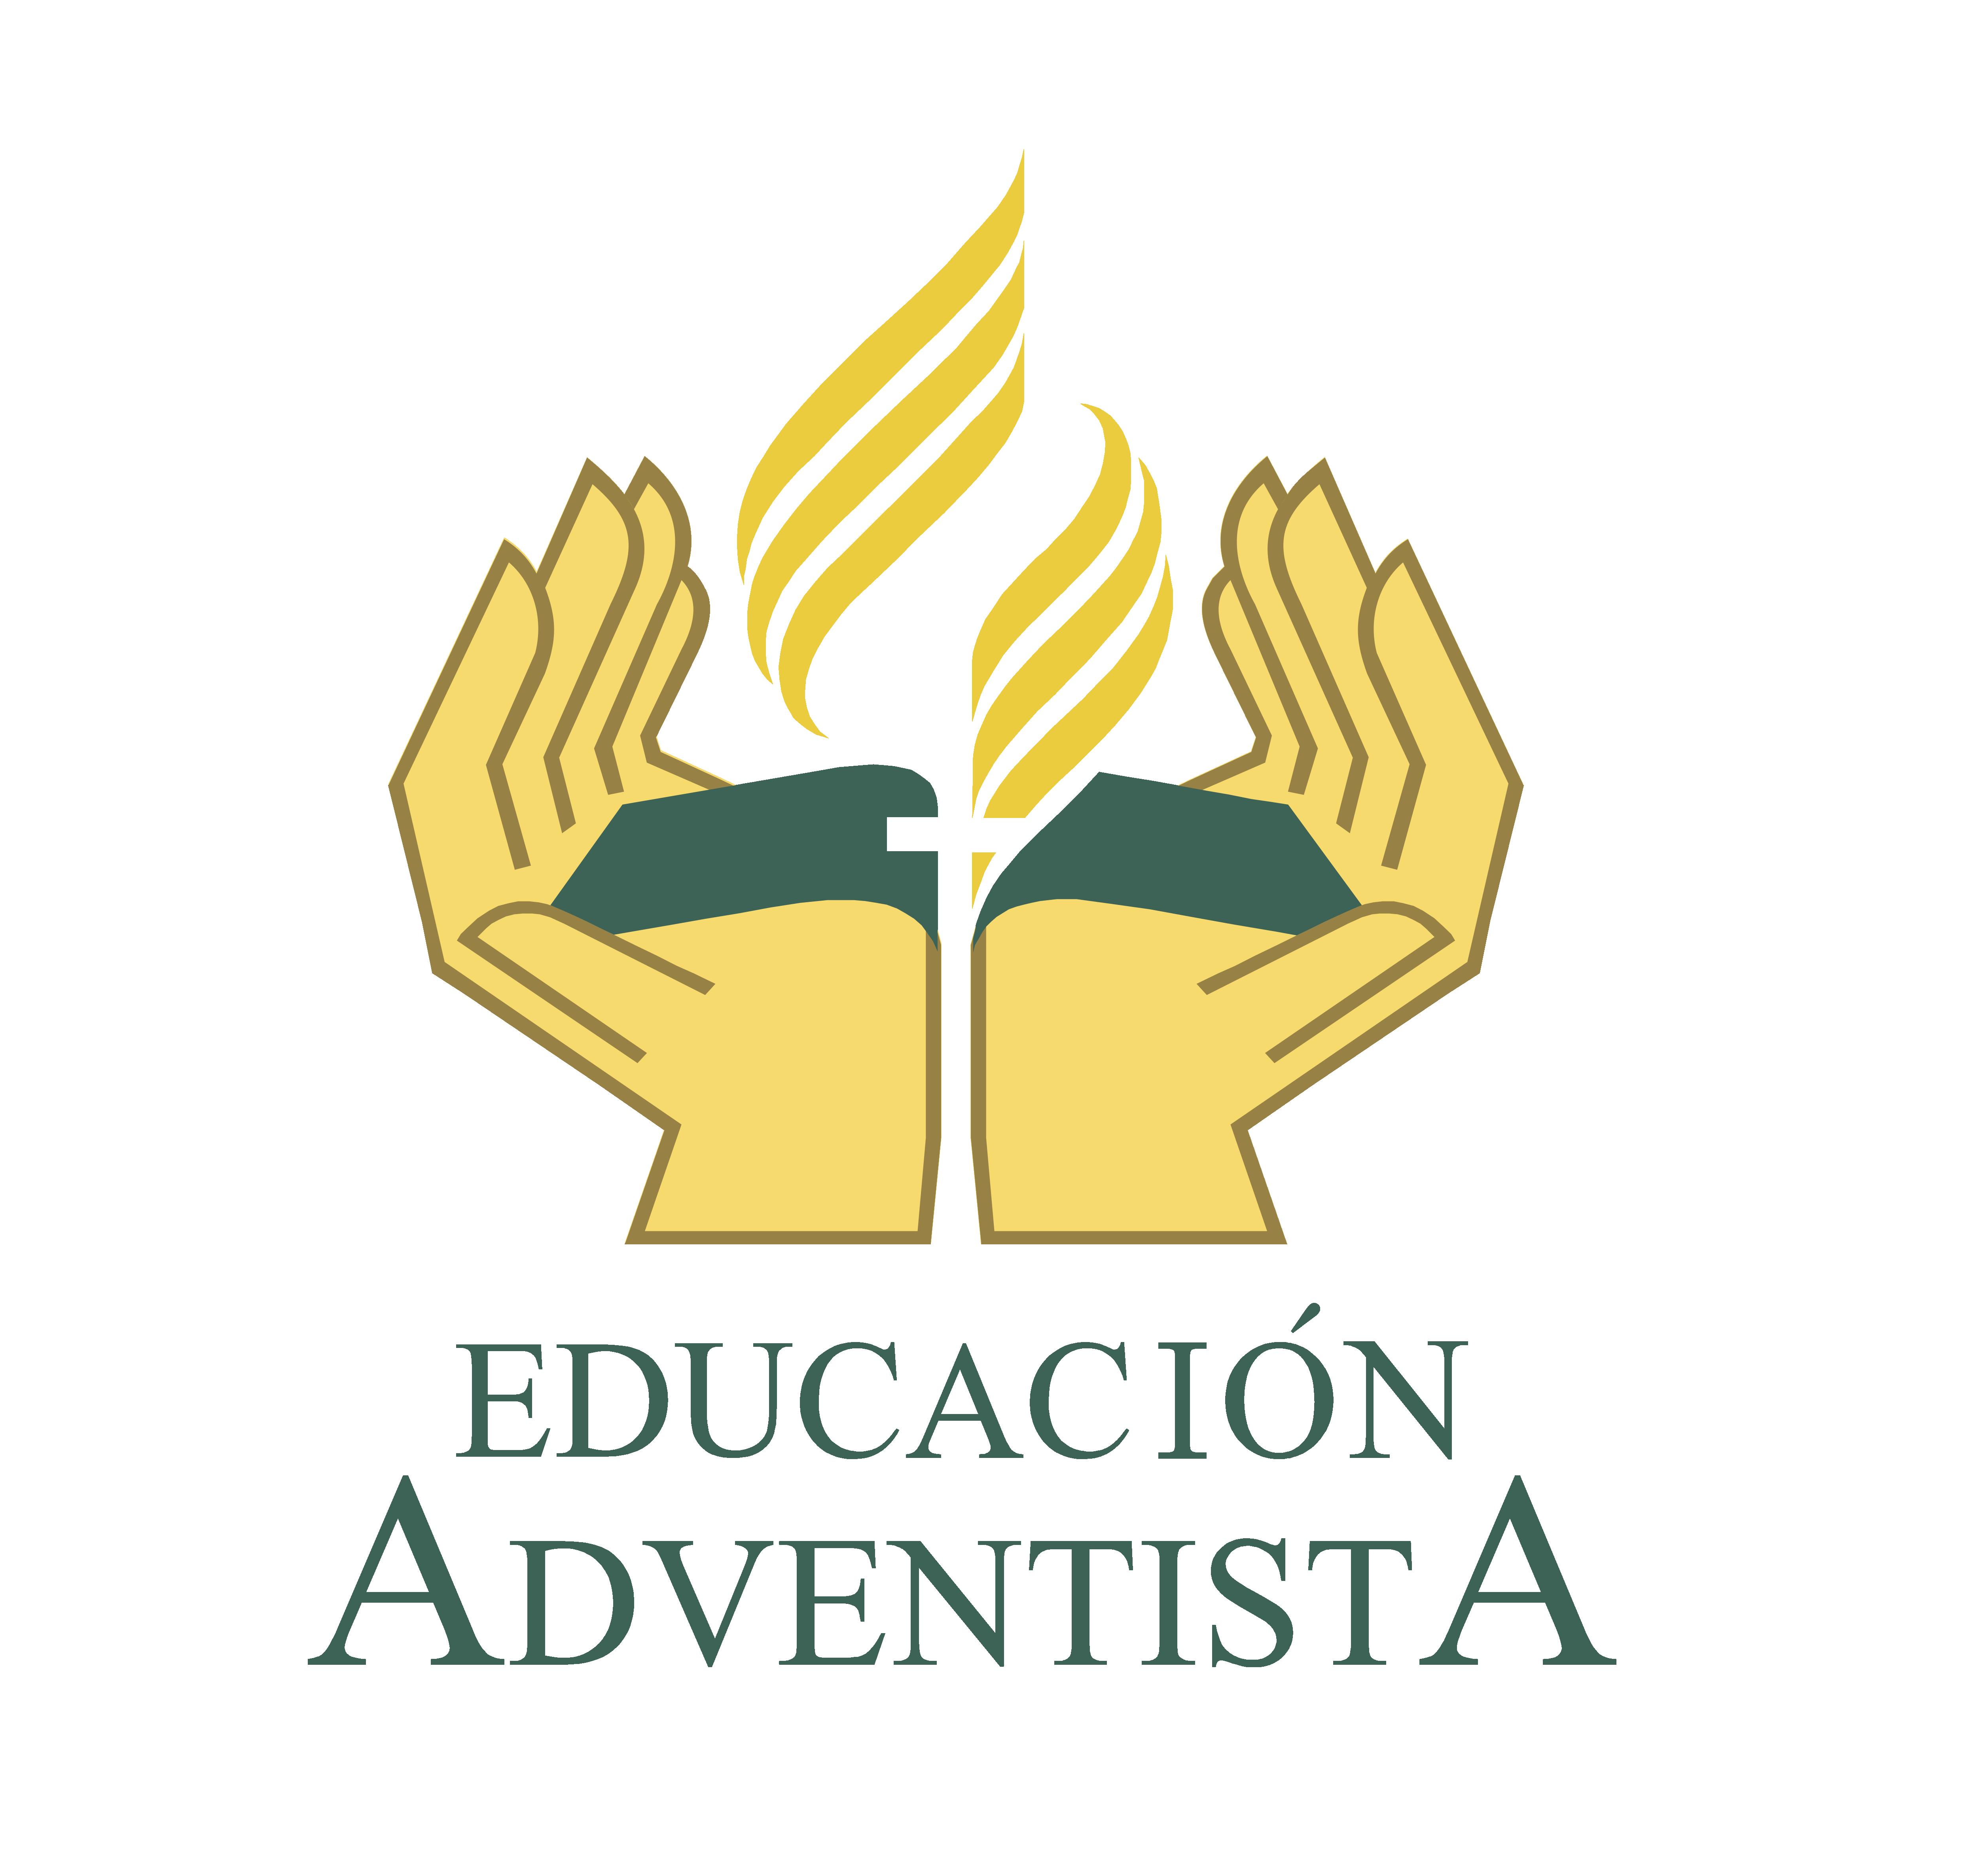 Fluidr / logo educacion adventista png by VICTOR_EFLT.